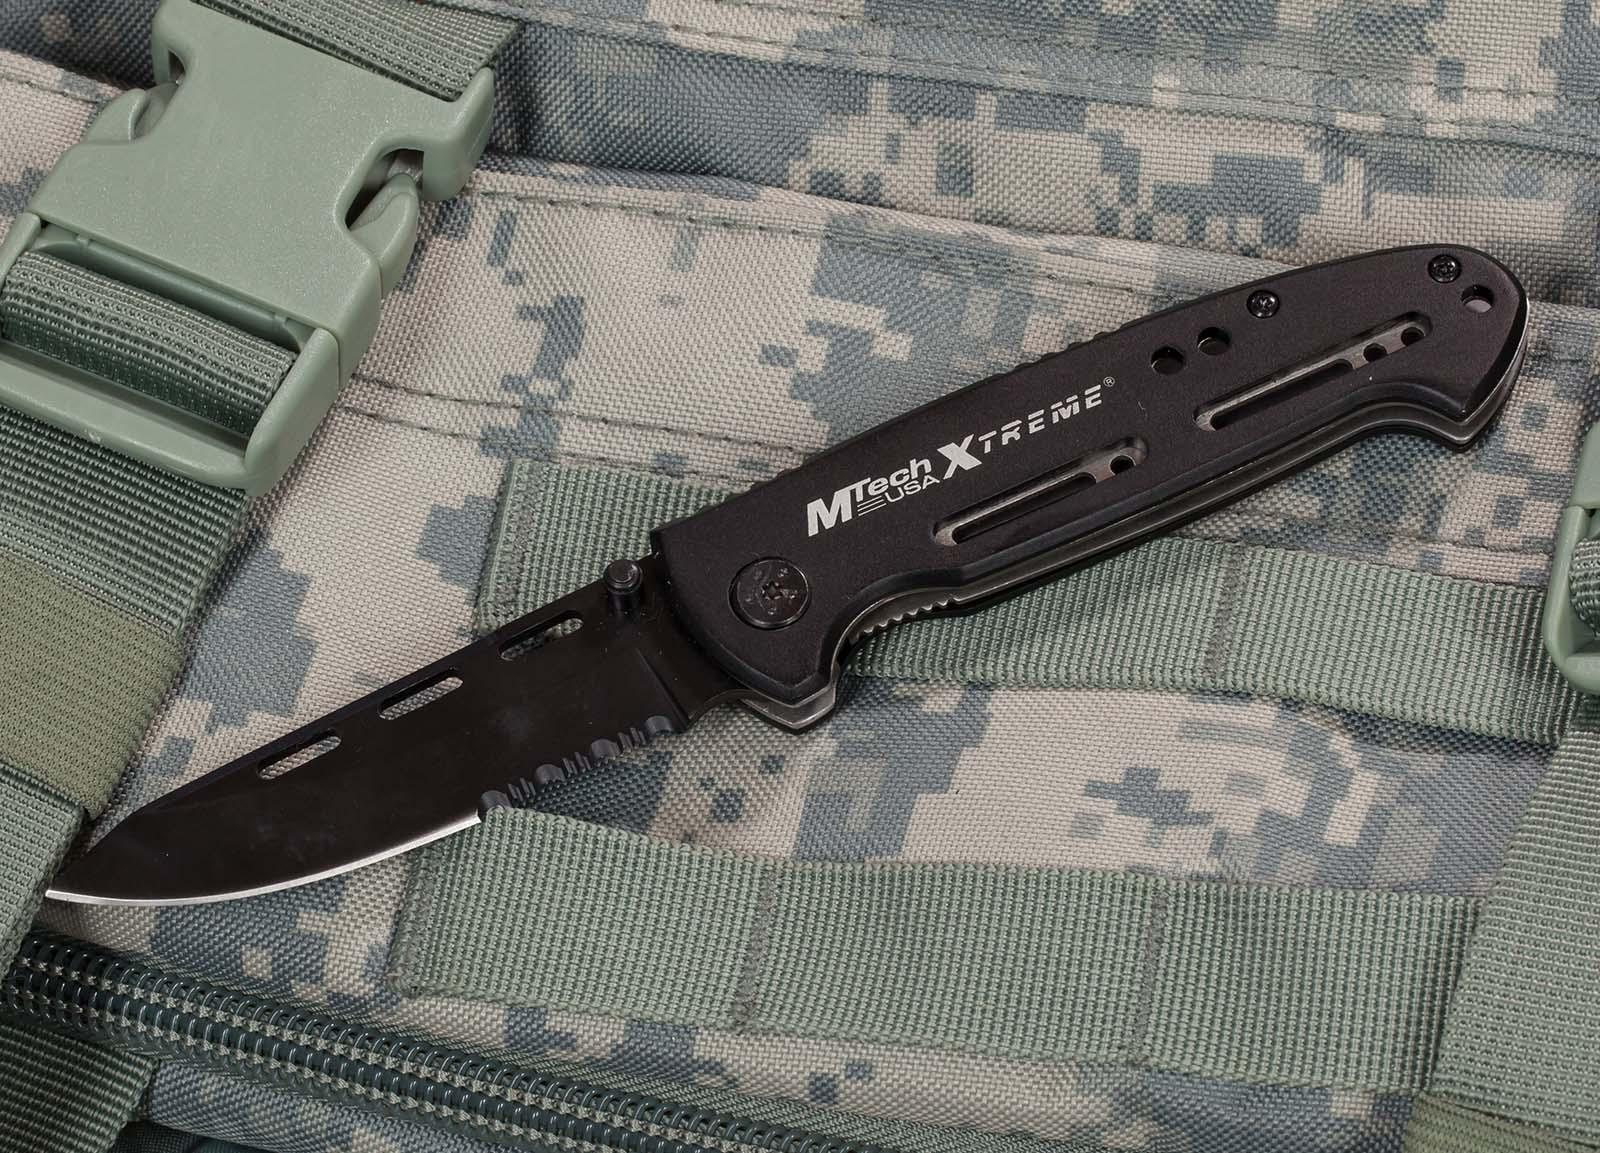 Тактический нож Mtech Xtreme MX-8022 BK